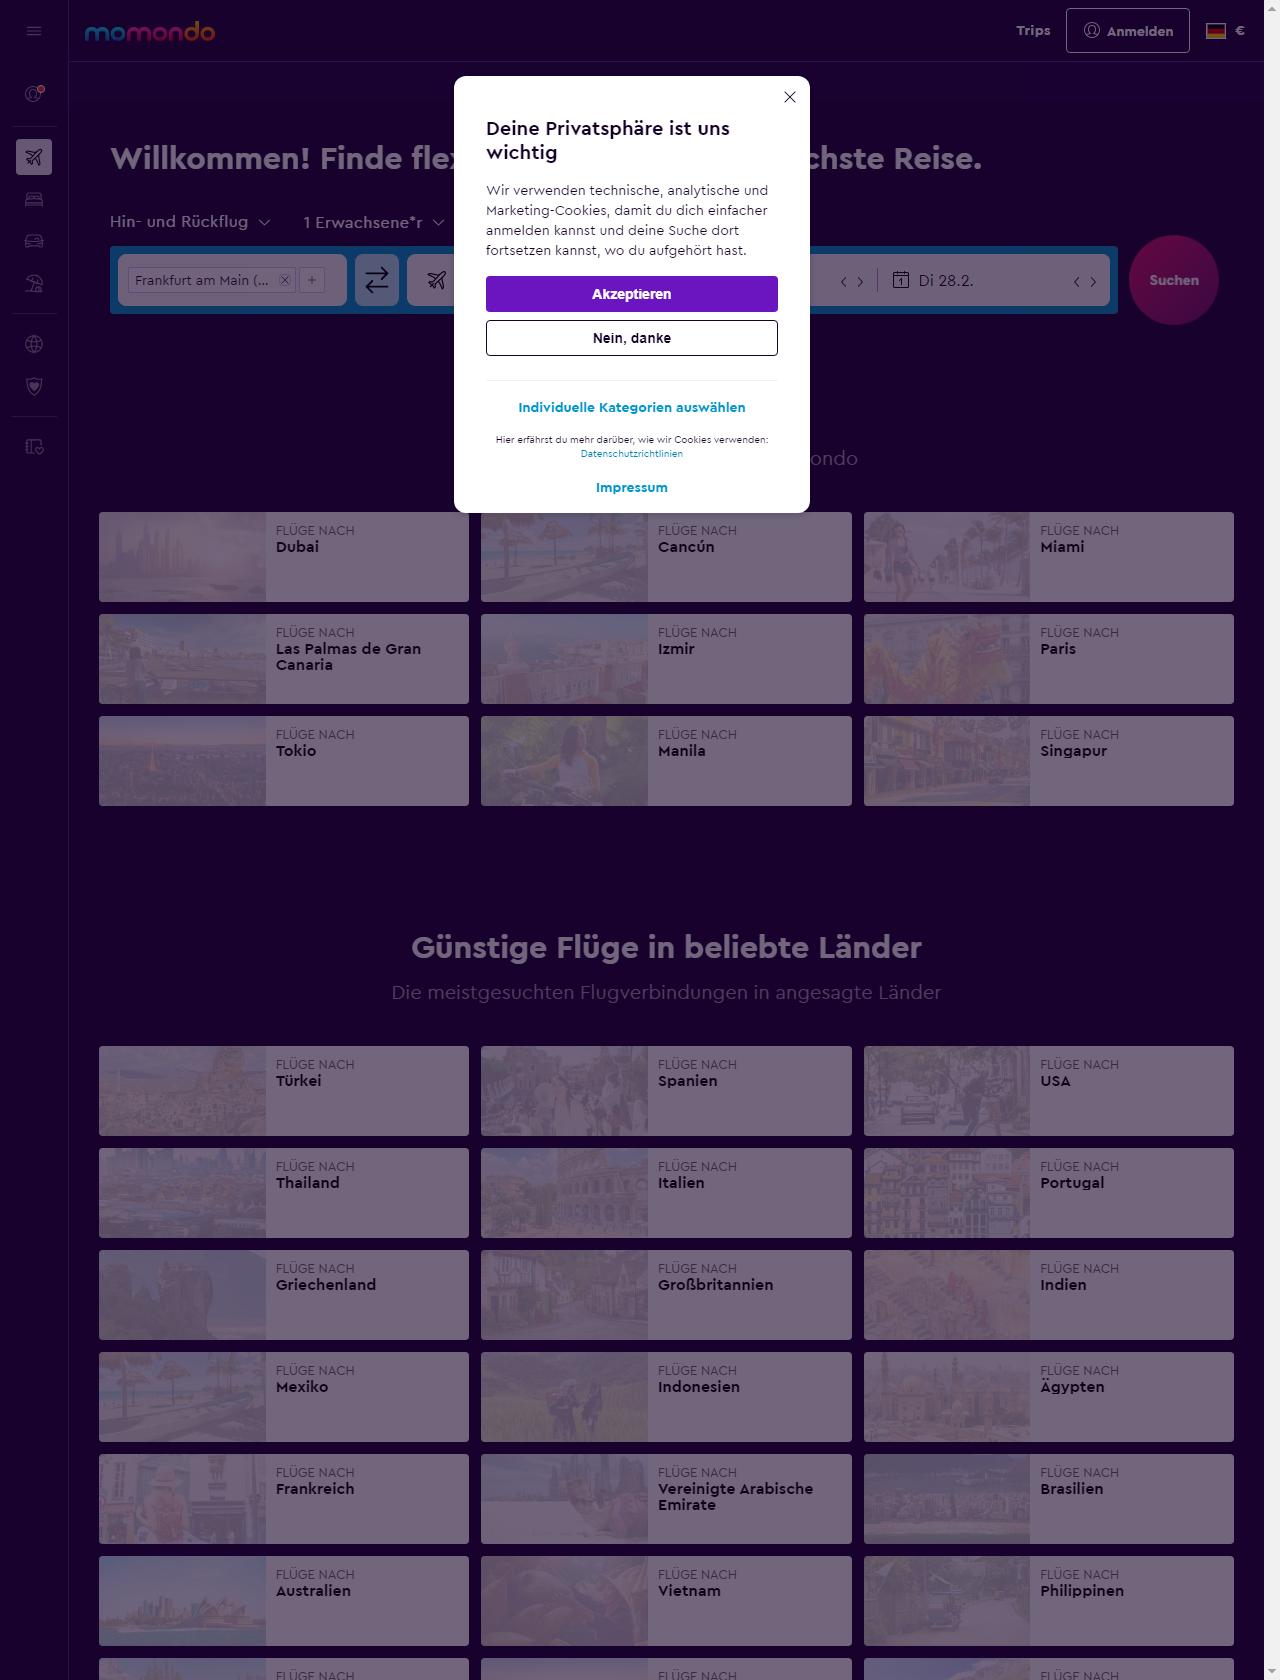 momondo.com   Make your website better   DNS, redirects, mixed ...